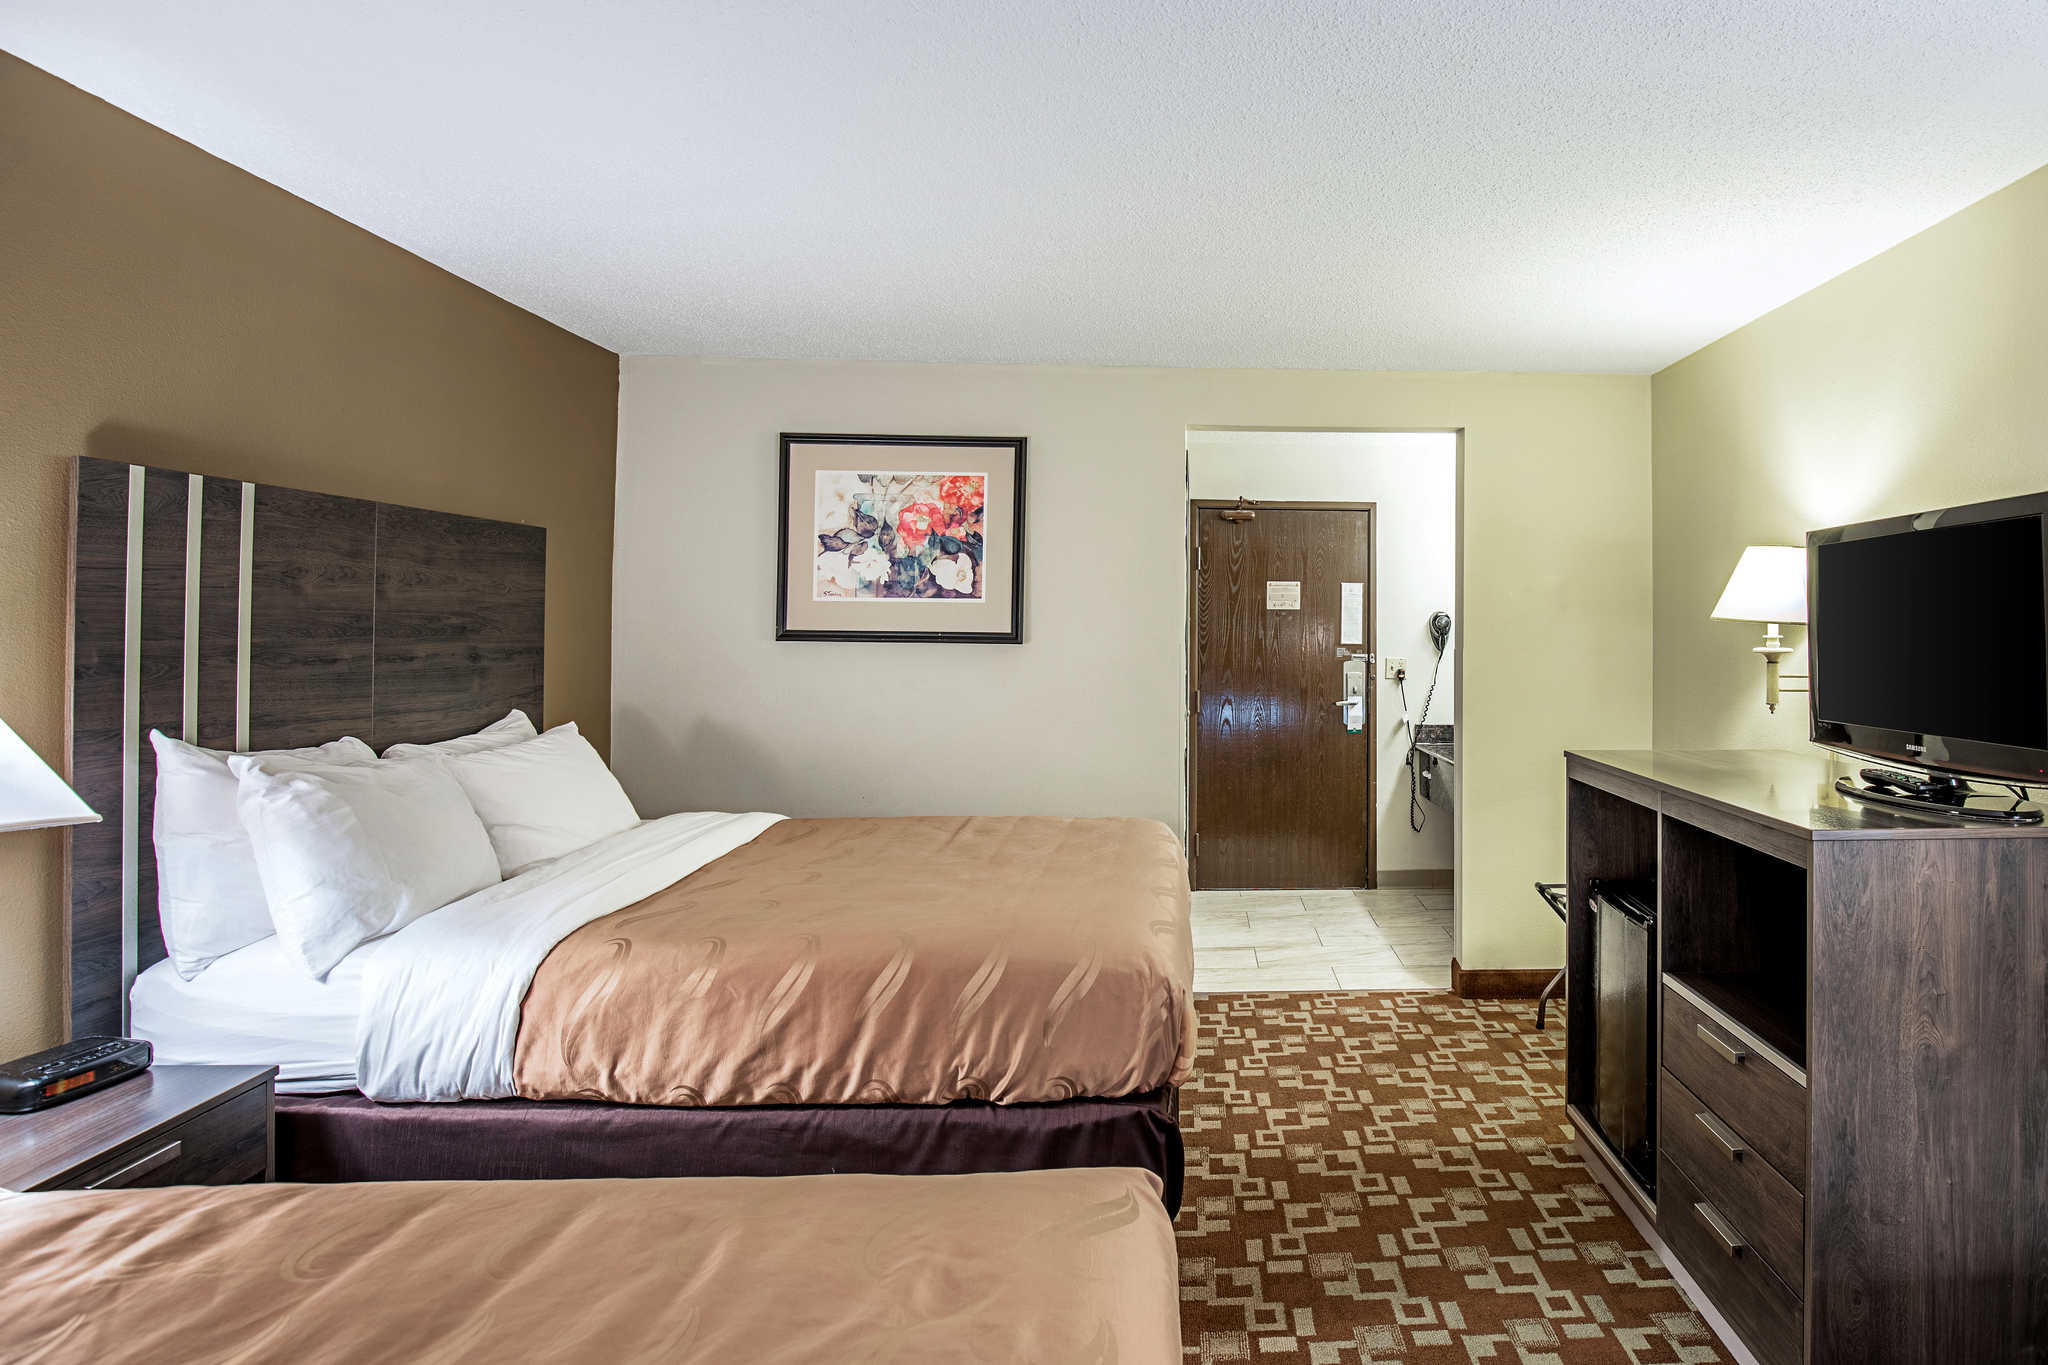 Quality Inn image 19